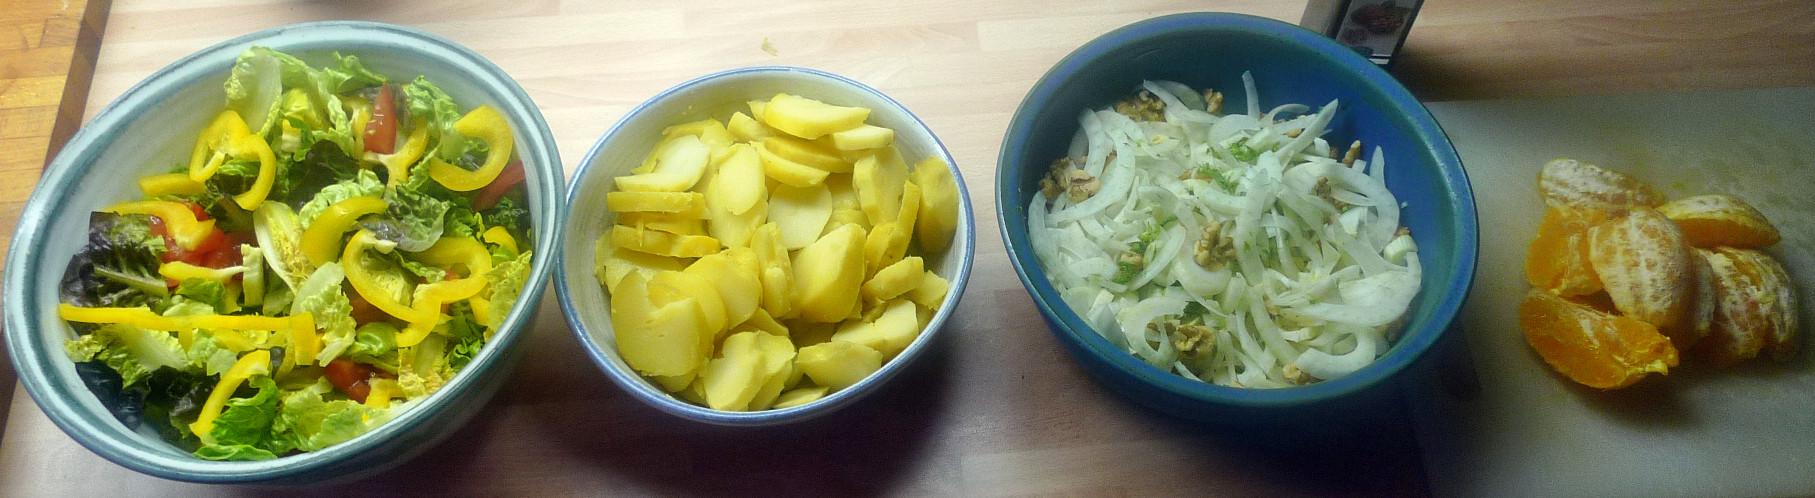 Guacamole,Fenchelsalat,Salat,Bratkartoffel--22.1.15   (4)